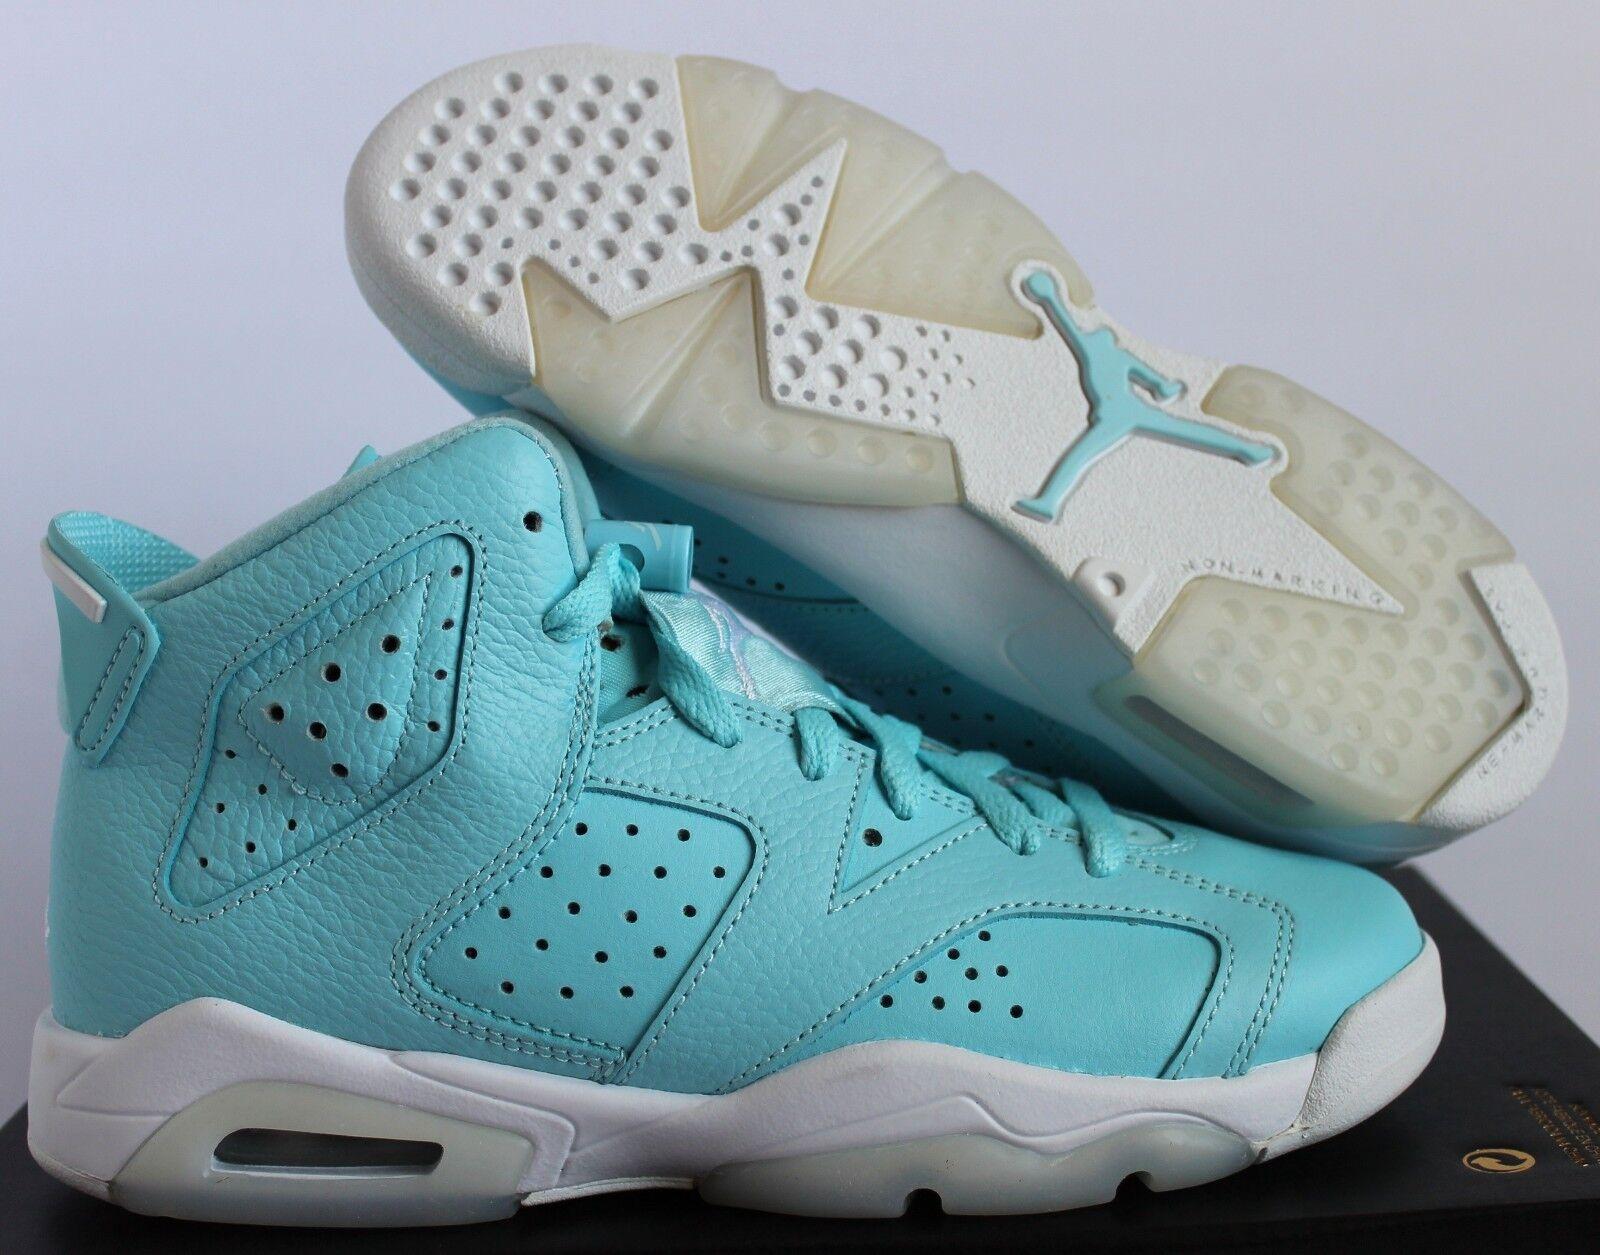 Nike Air Jordan 6 Retro GG Still Bleu- blanc SZ 5Y// femmes SZ 6.5 [543390-407]